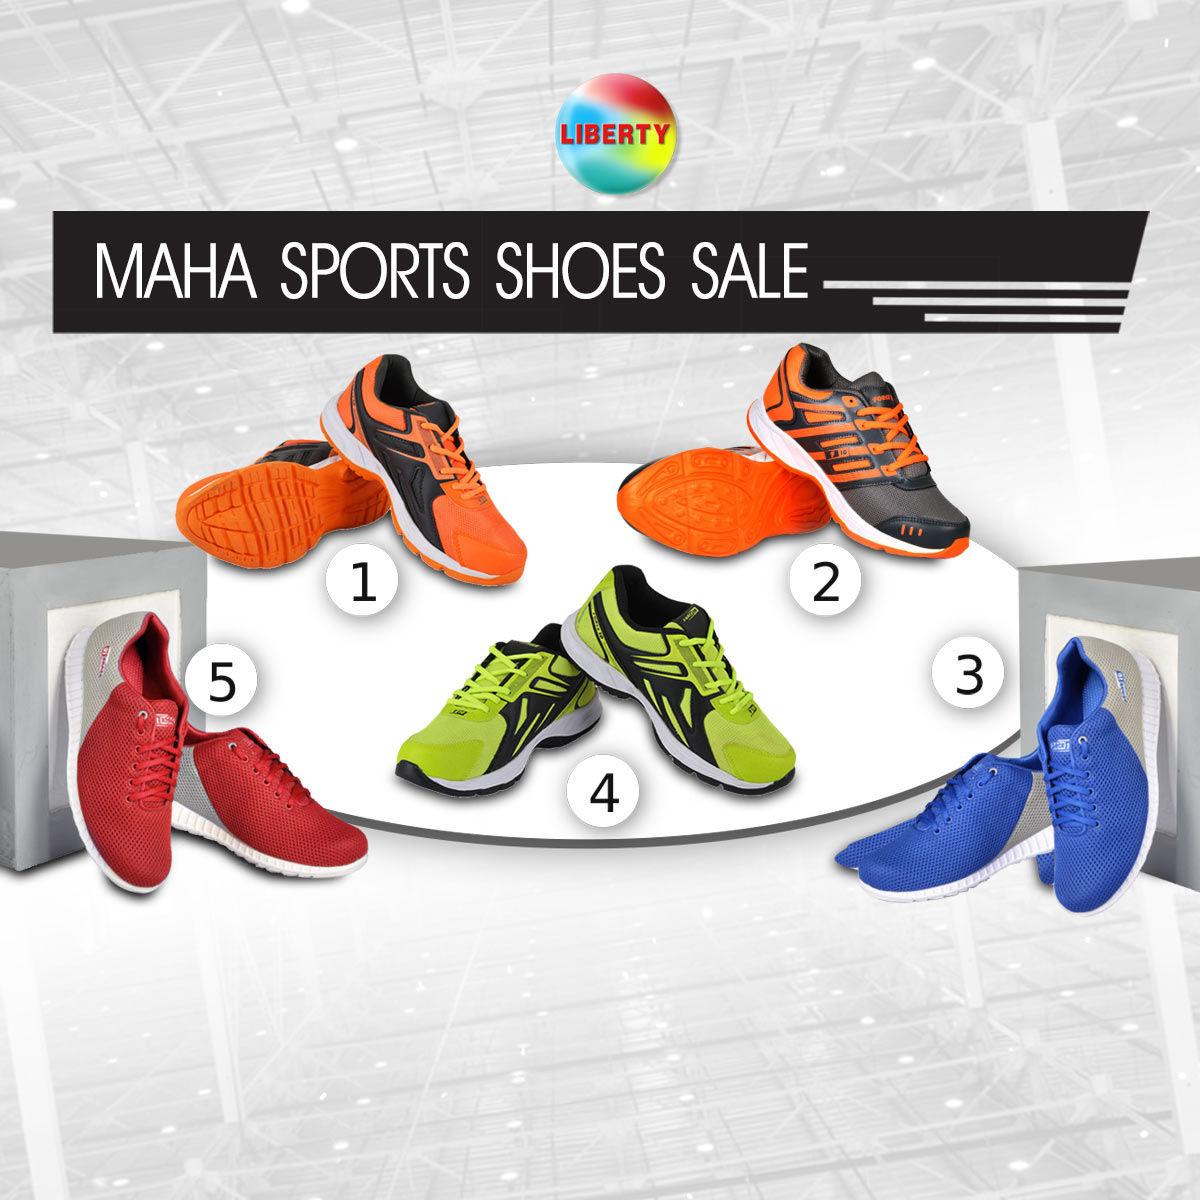 Buy Liberty Maha Sports Shoes Sale